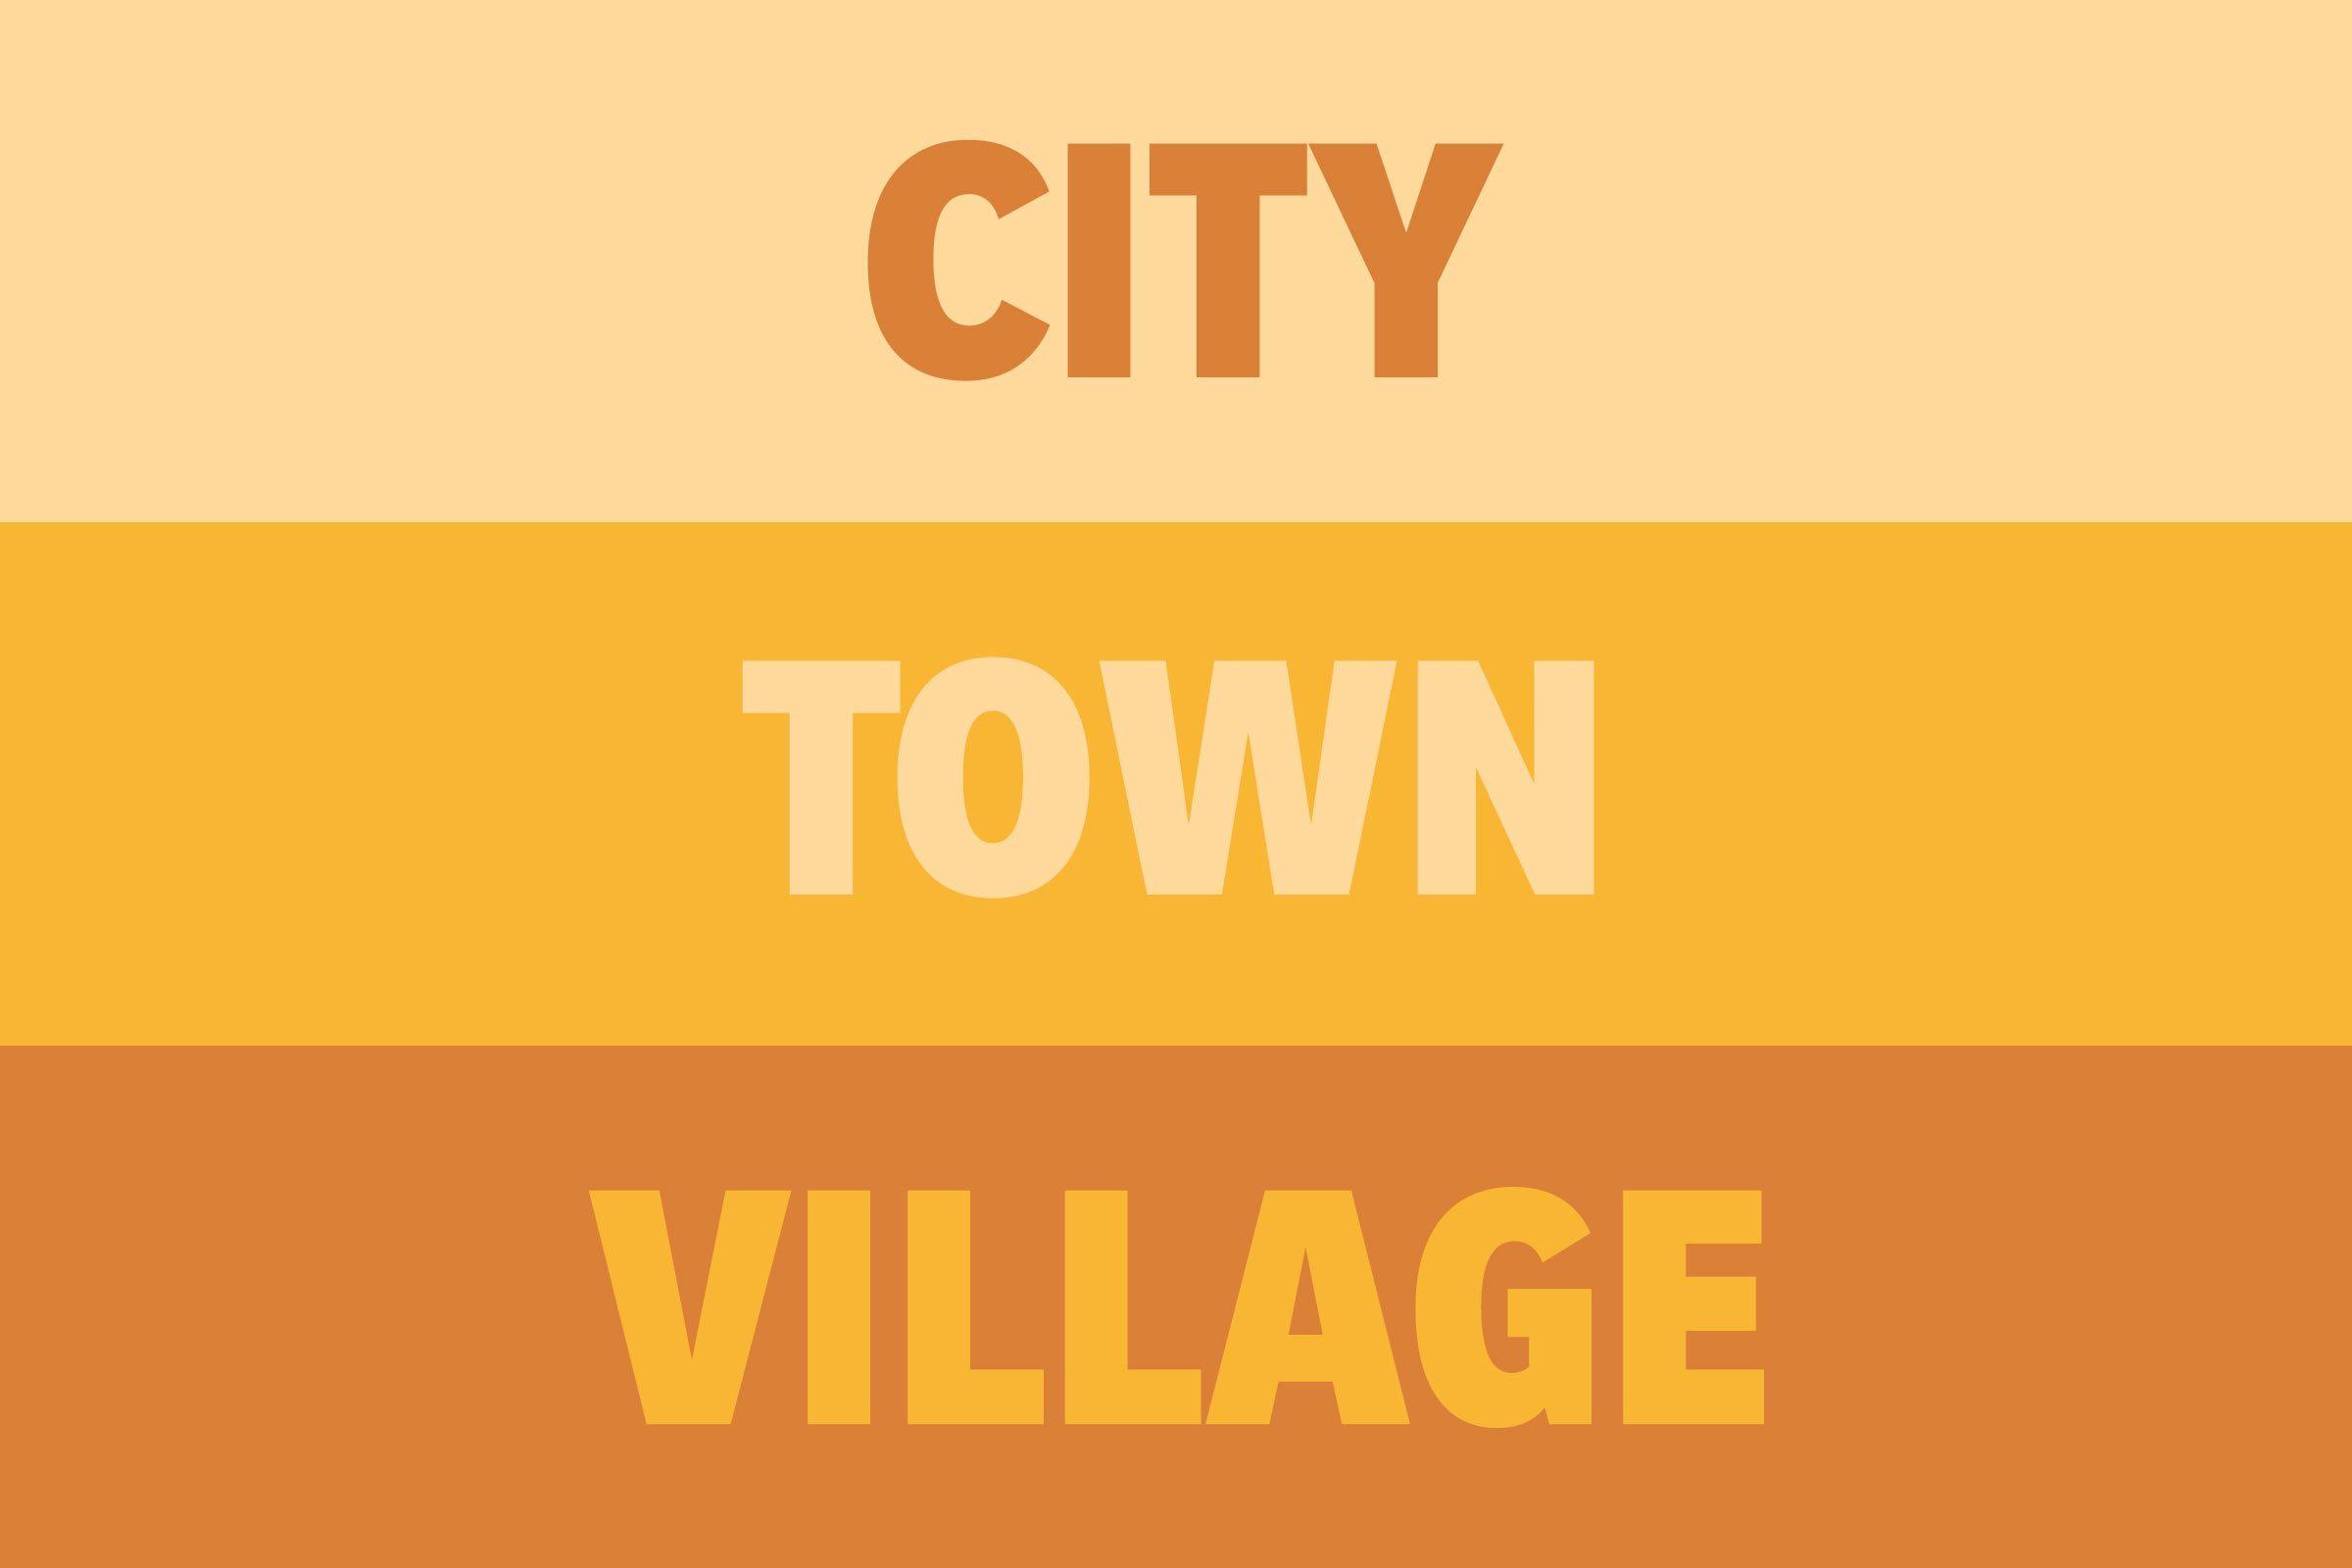 City vs Town vs Village